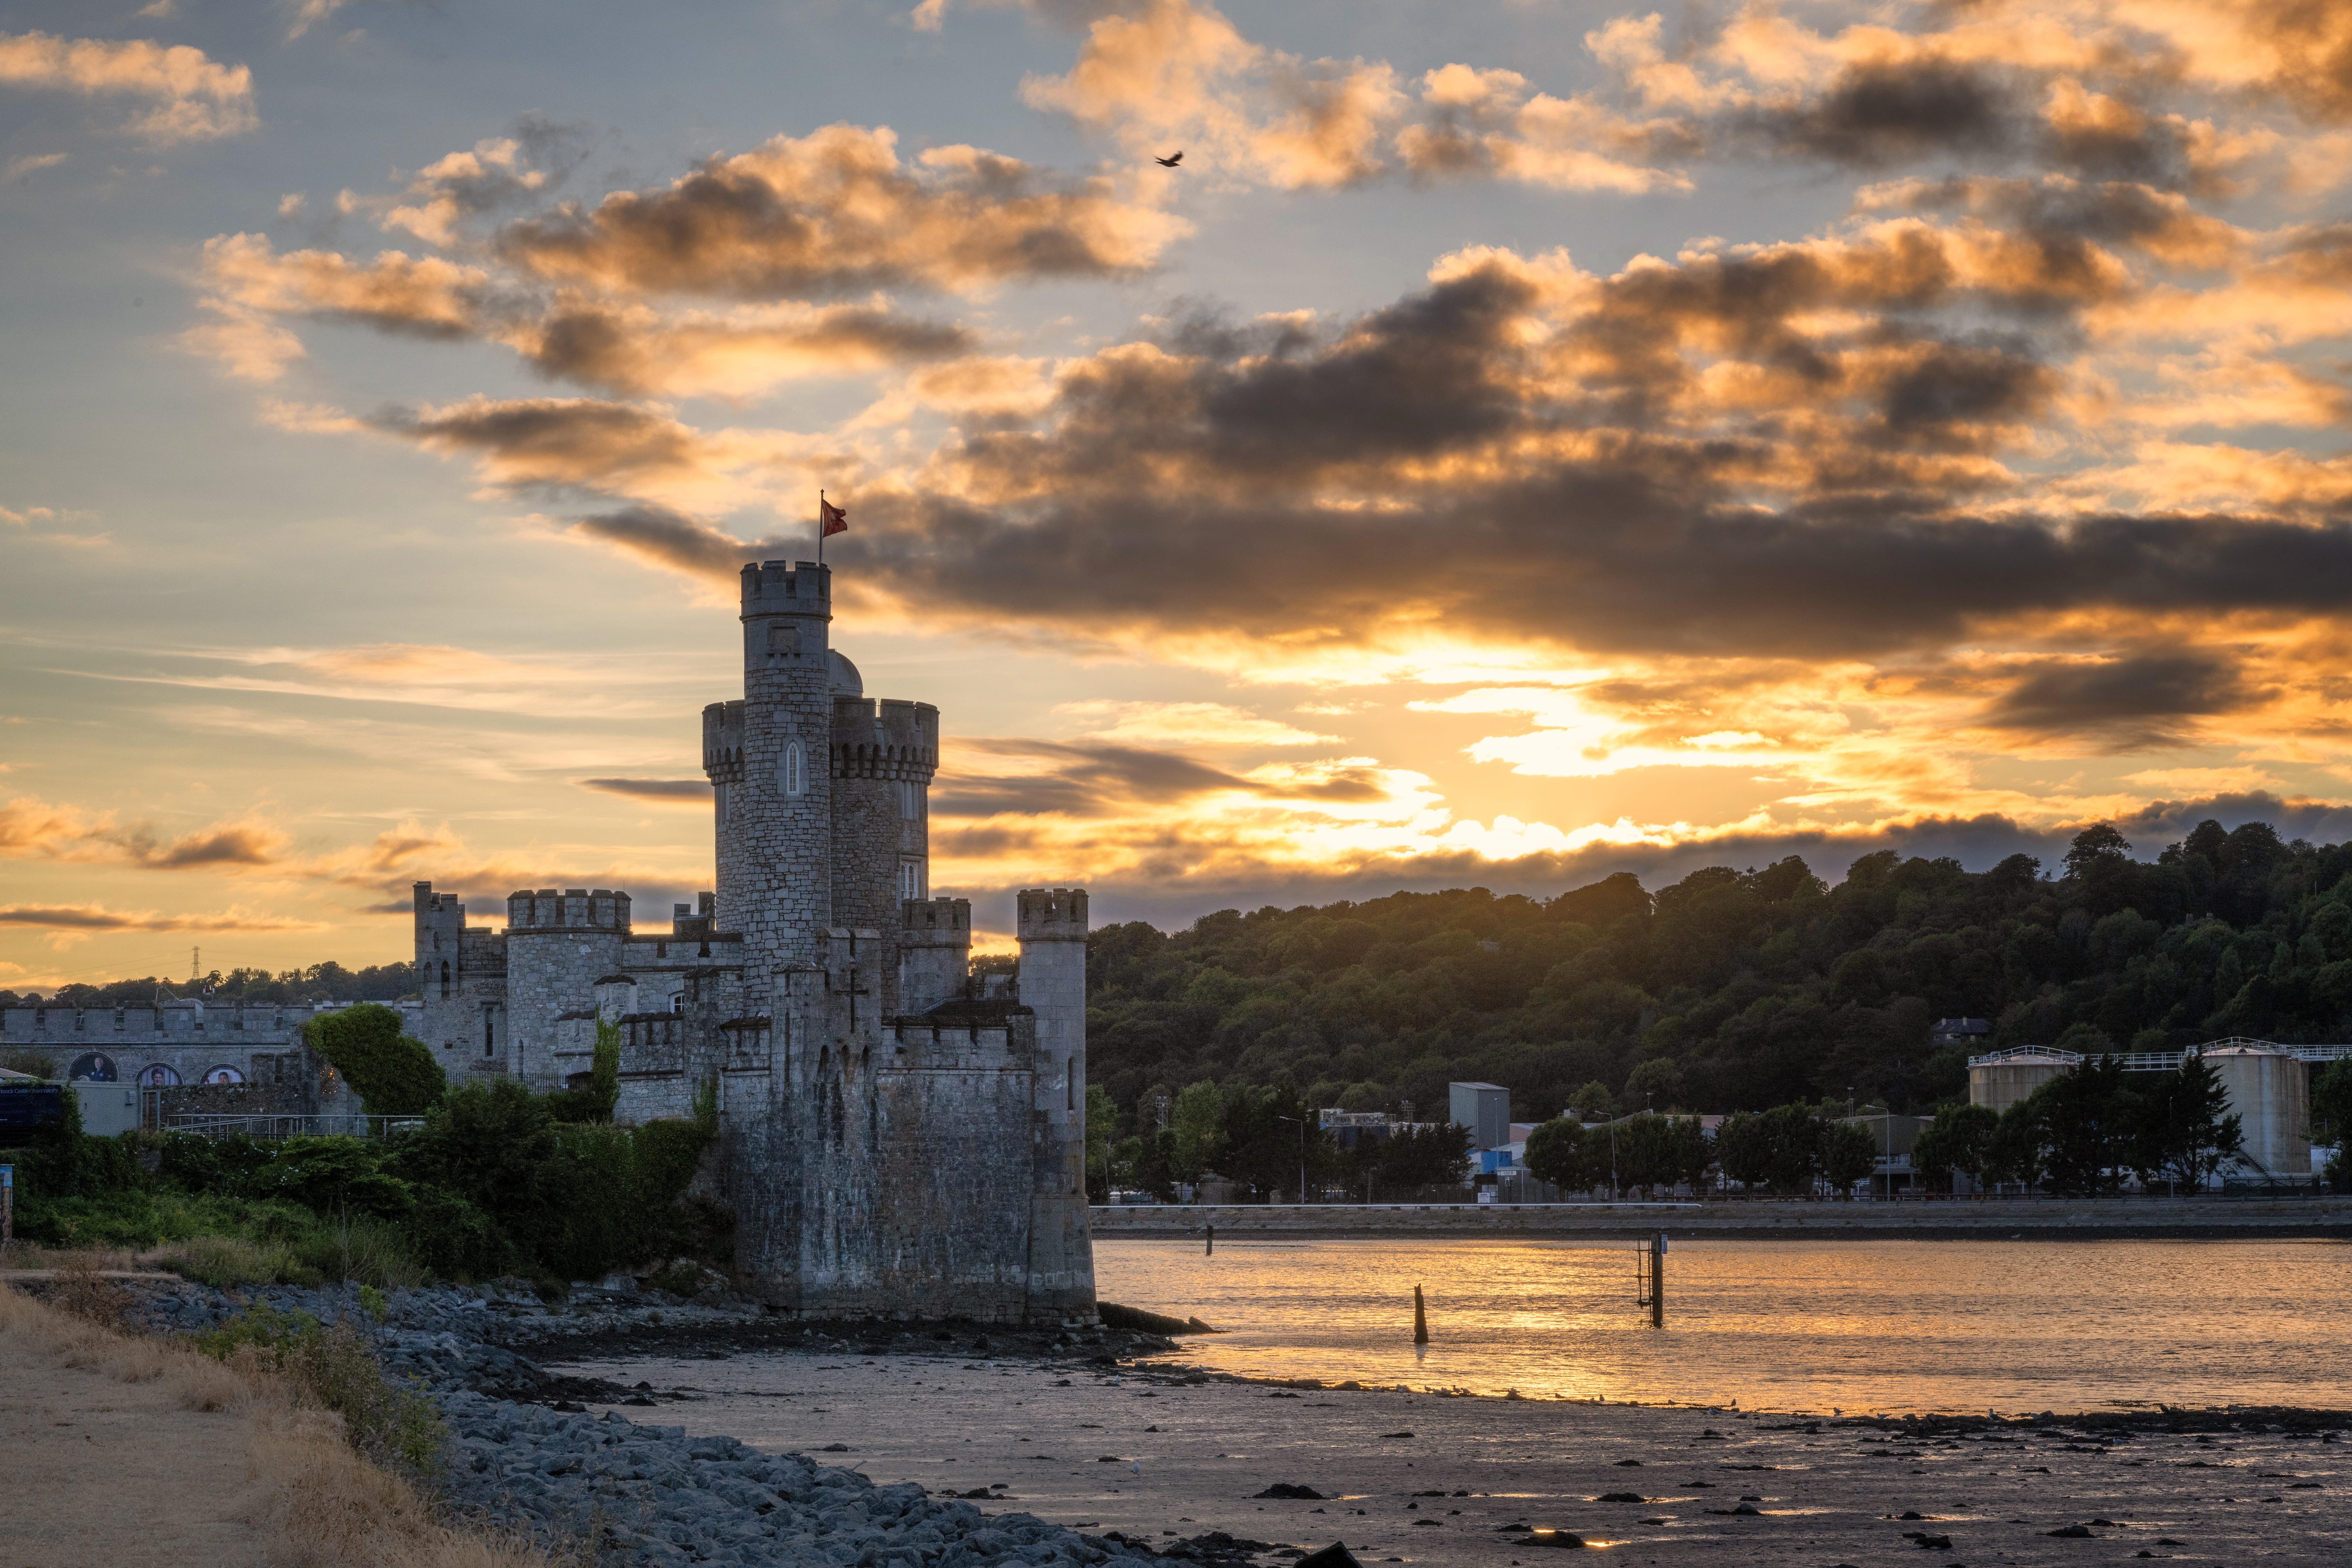 Blackrock Castle, County Cork, Ireland